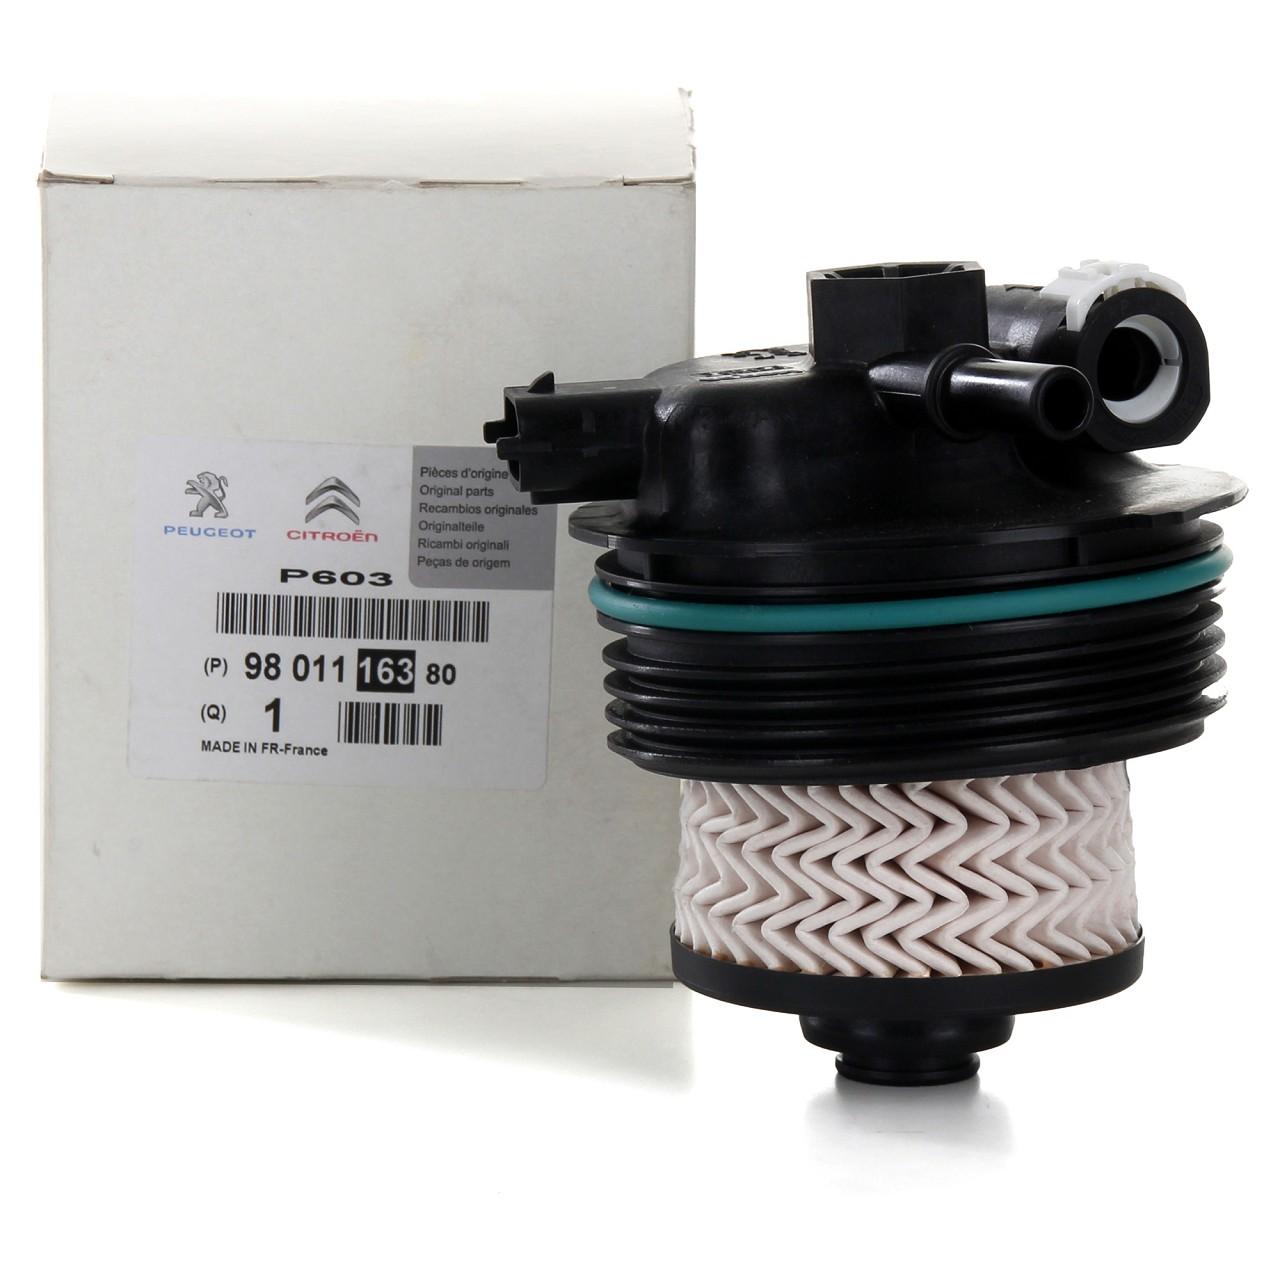 ORIGINAL Citroen Peugeot Kraftstofffilter Dieselfilter 1.6/2.0 HDi 9801116380